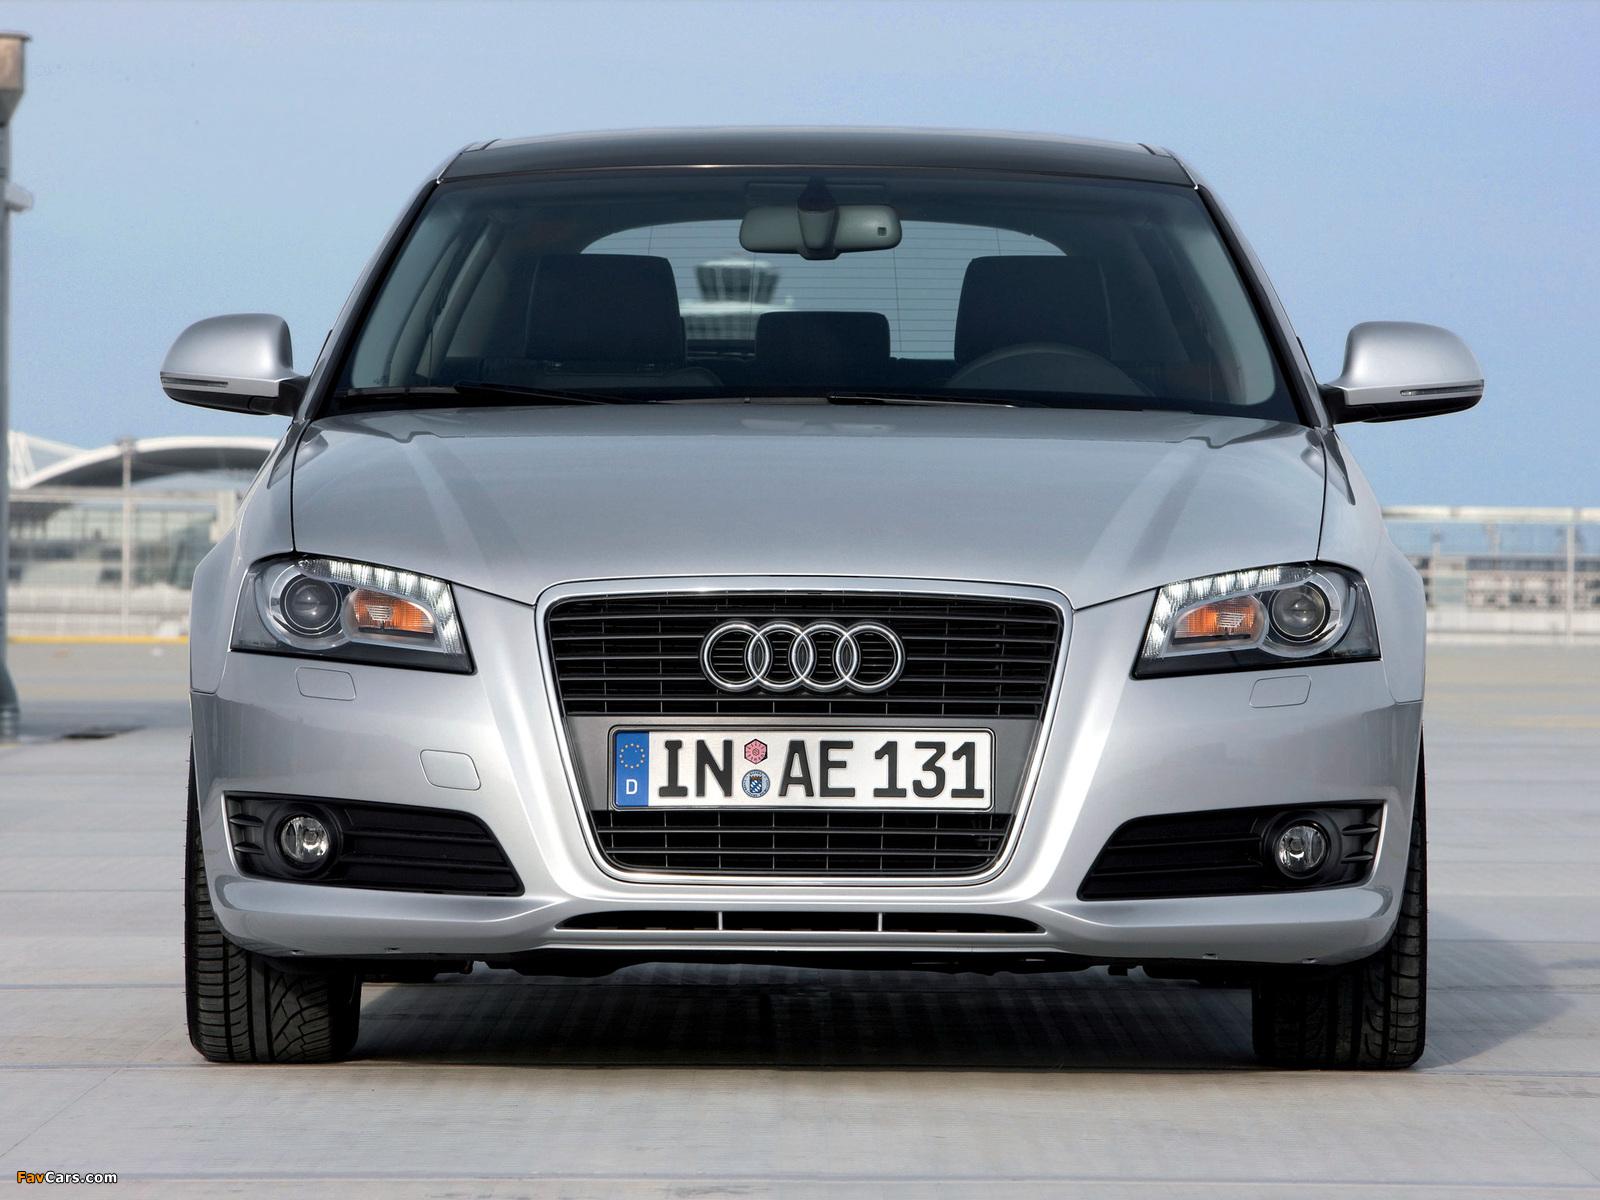 Audi A 3 2010 >> Audi A3 Sportback 8PA (2008–2010) images (1600x1200)